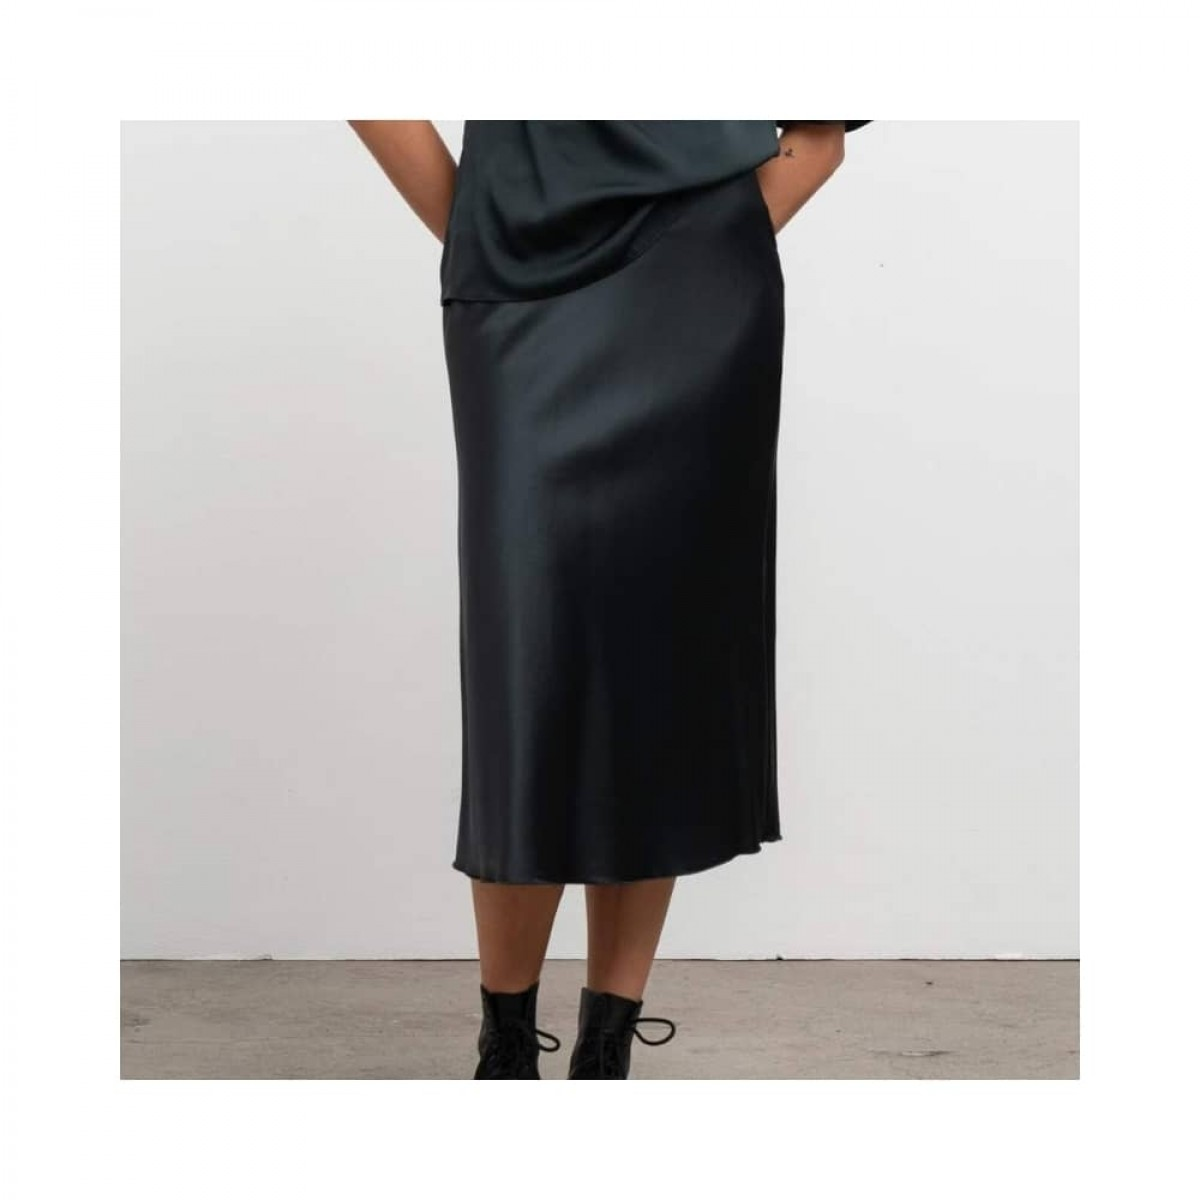 hana nederdel - deep forest - model nederdel